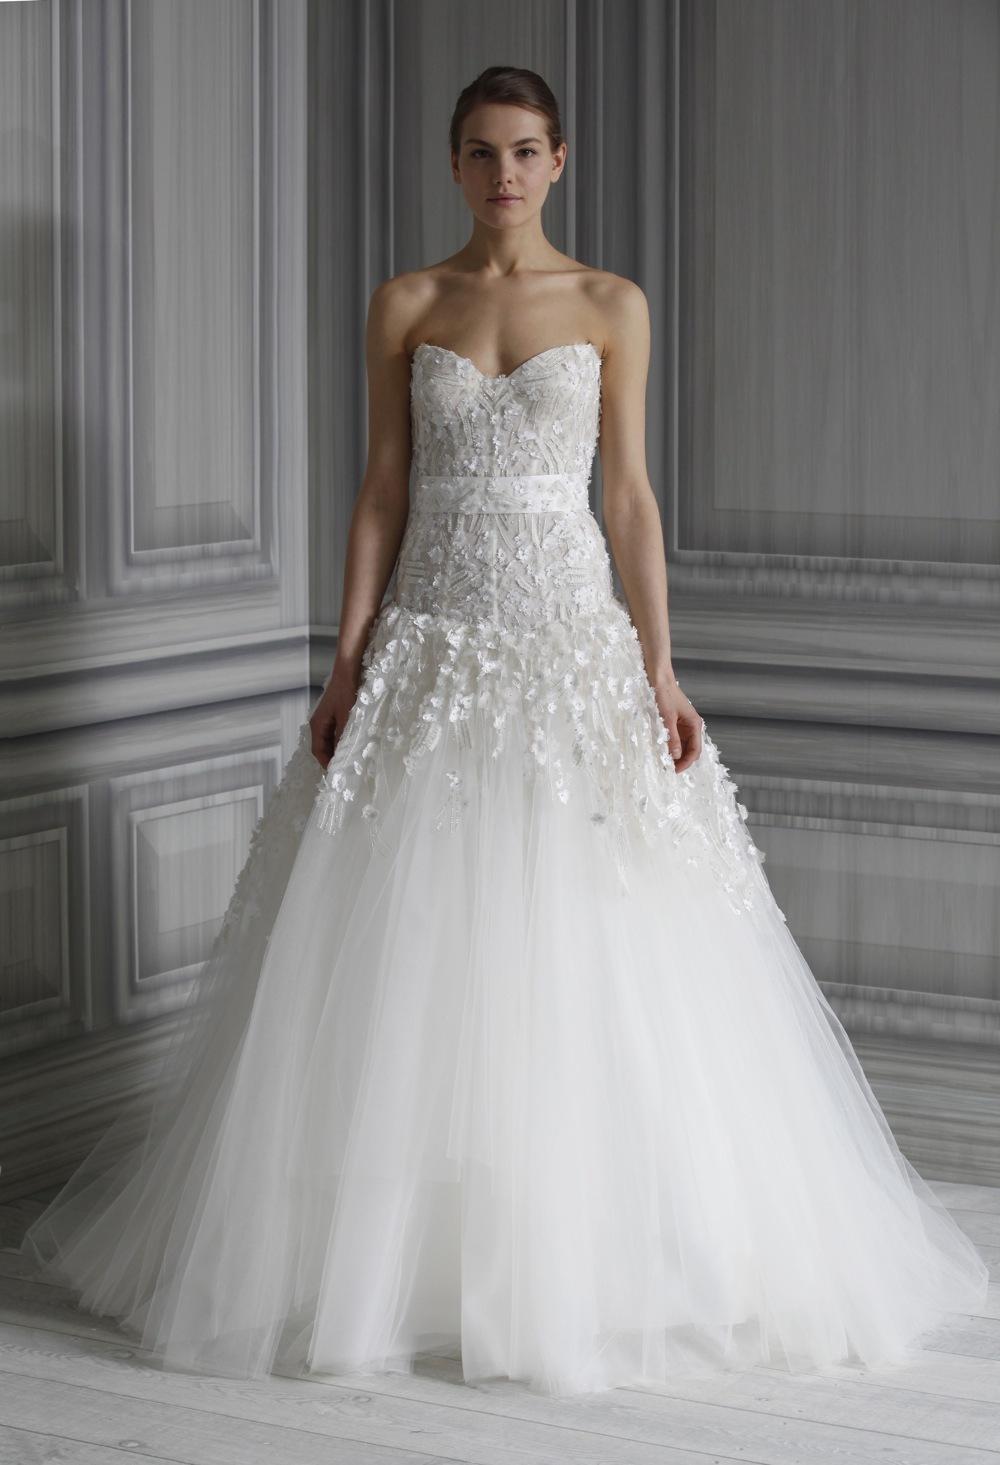 Wedding-dress-monique-lhuillier-bridal-gowns-spring-2012-aphrodite.full